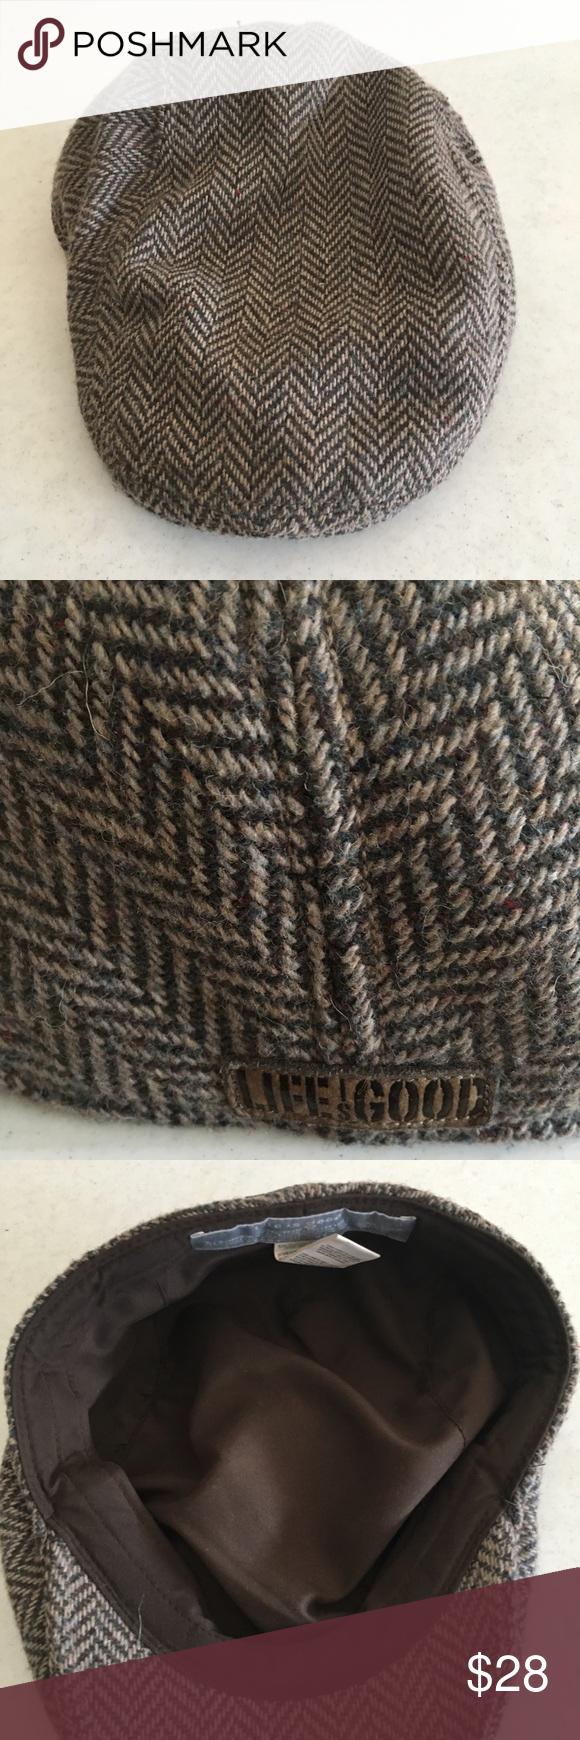 c2e5f392e6 Black Friday Sale Life Is Good Men's hat Black Friday Sale This Life Is  Good Men's hat Life Is Good Accessories Hats